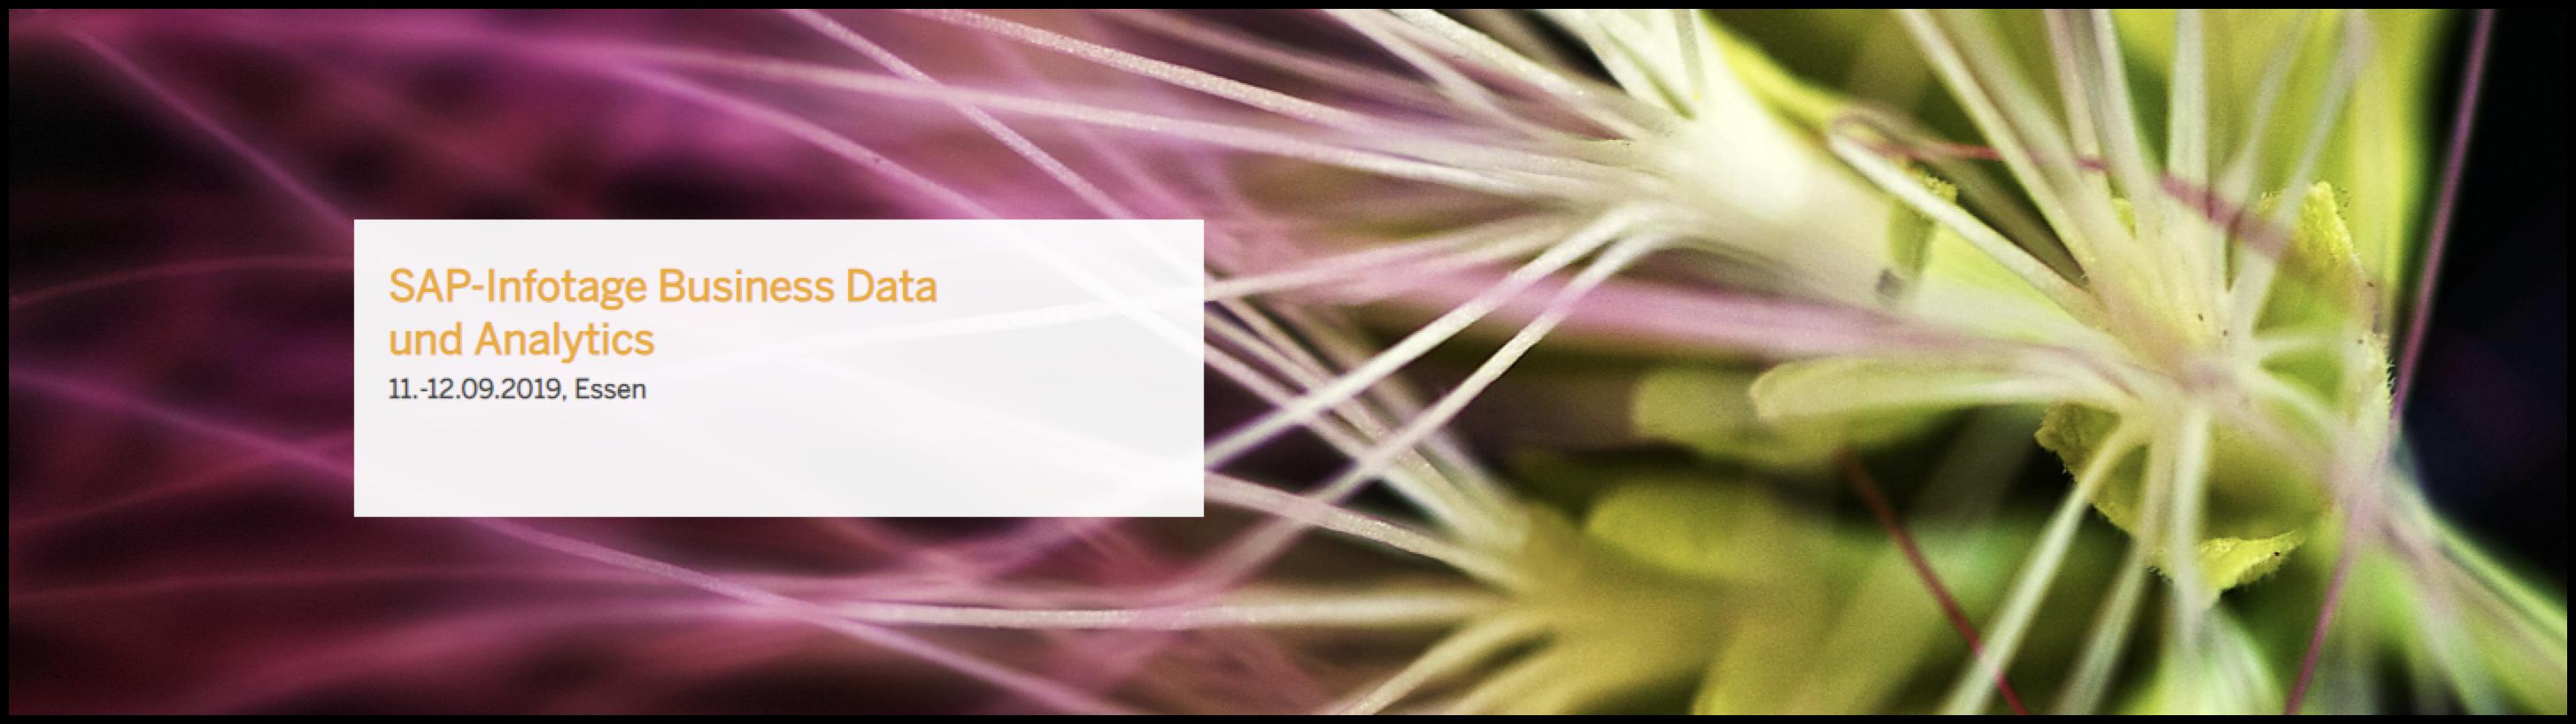 SAP-Infotage 2019